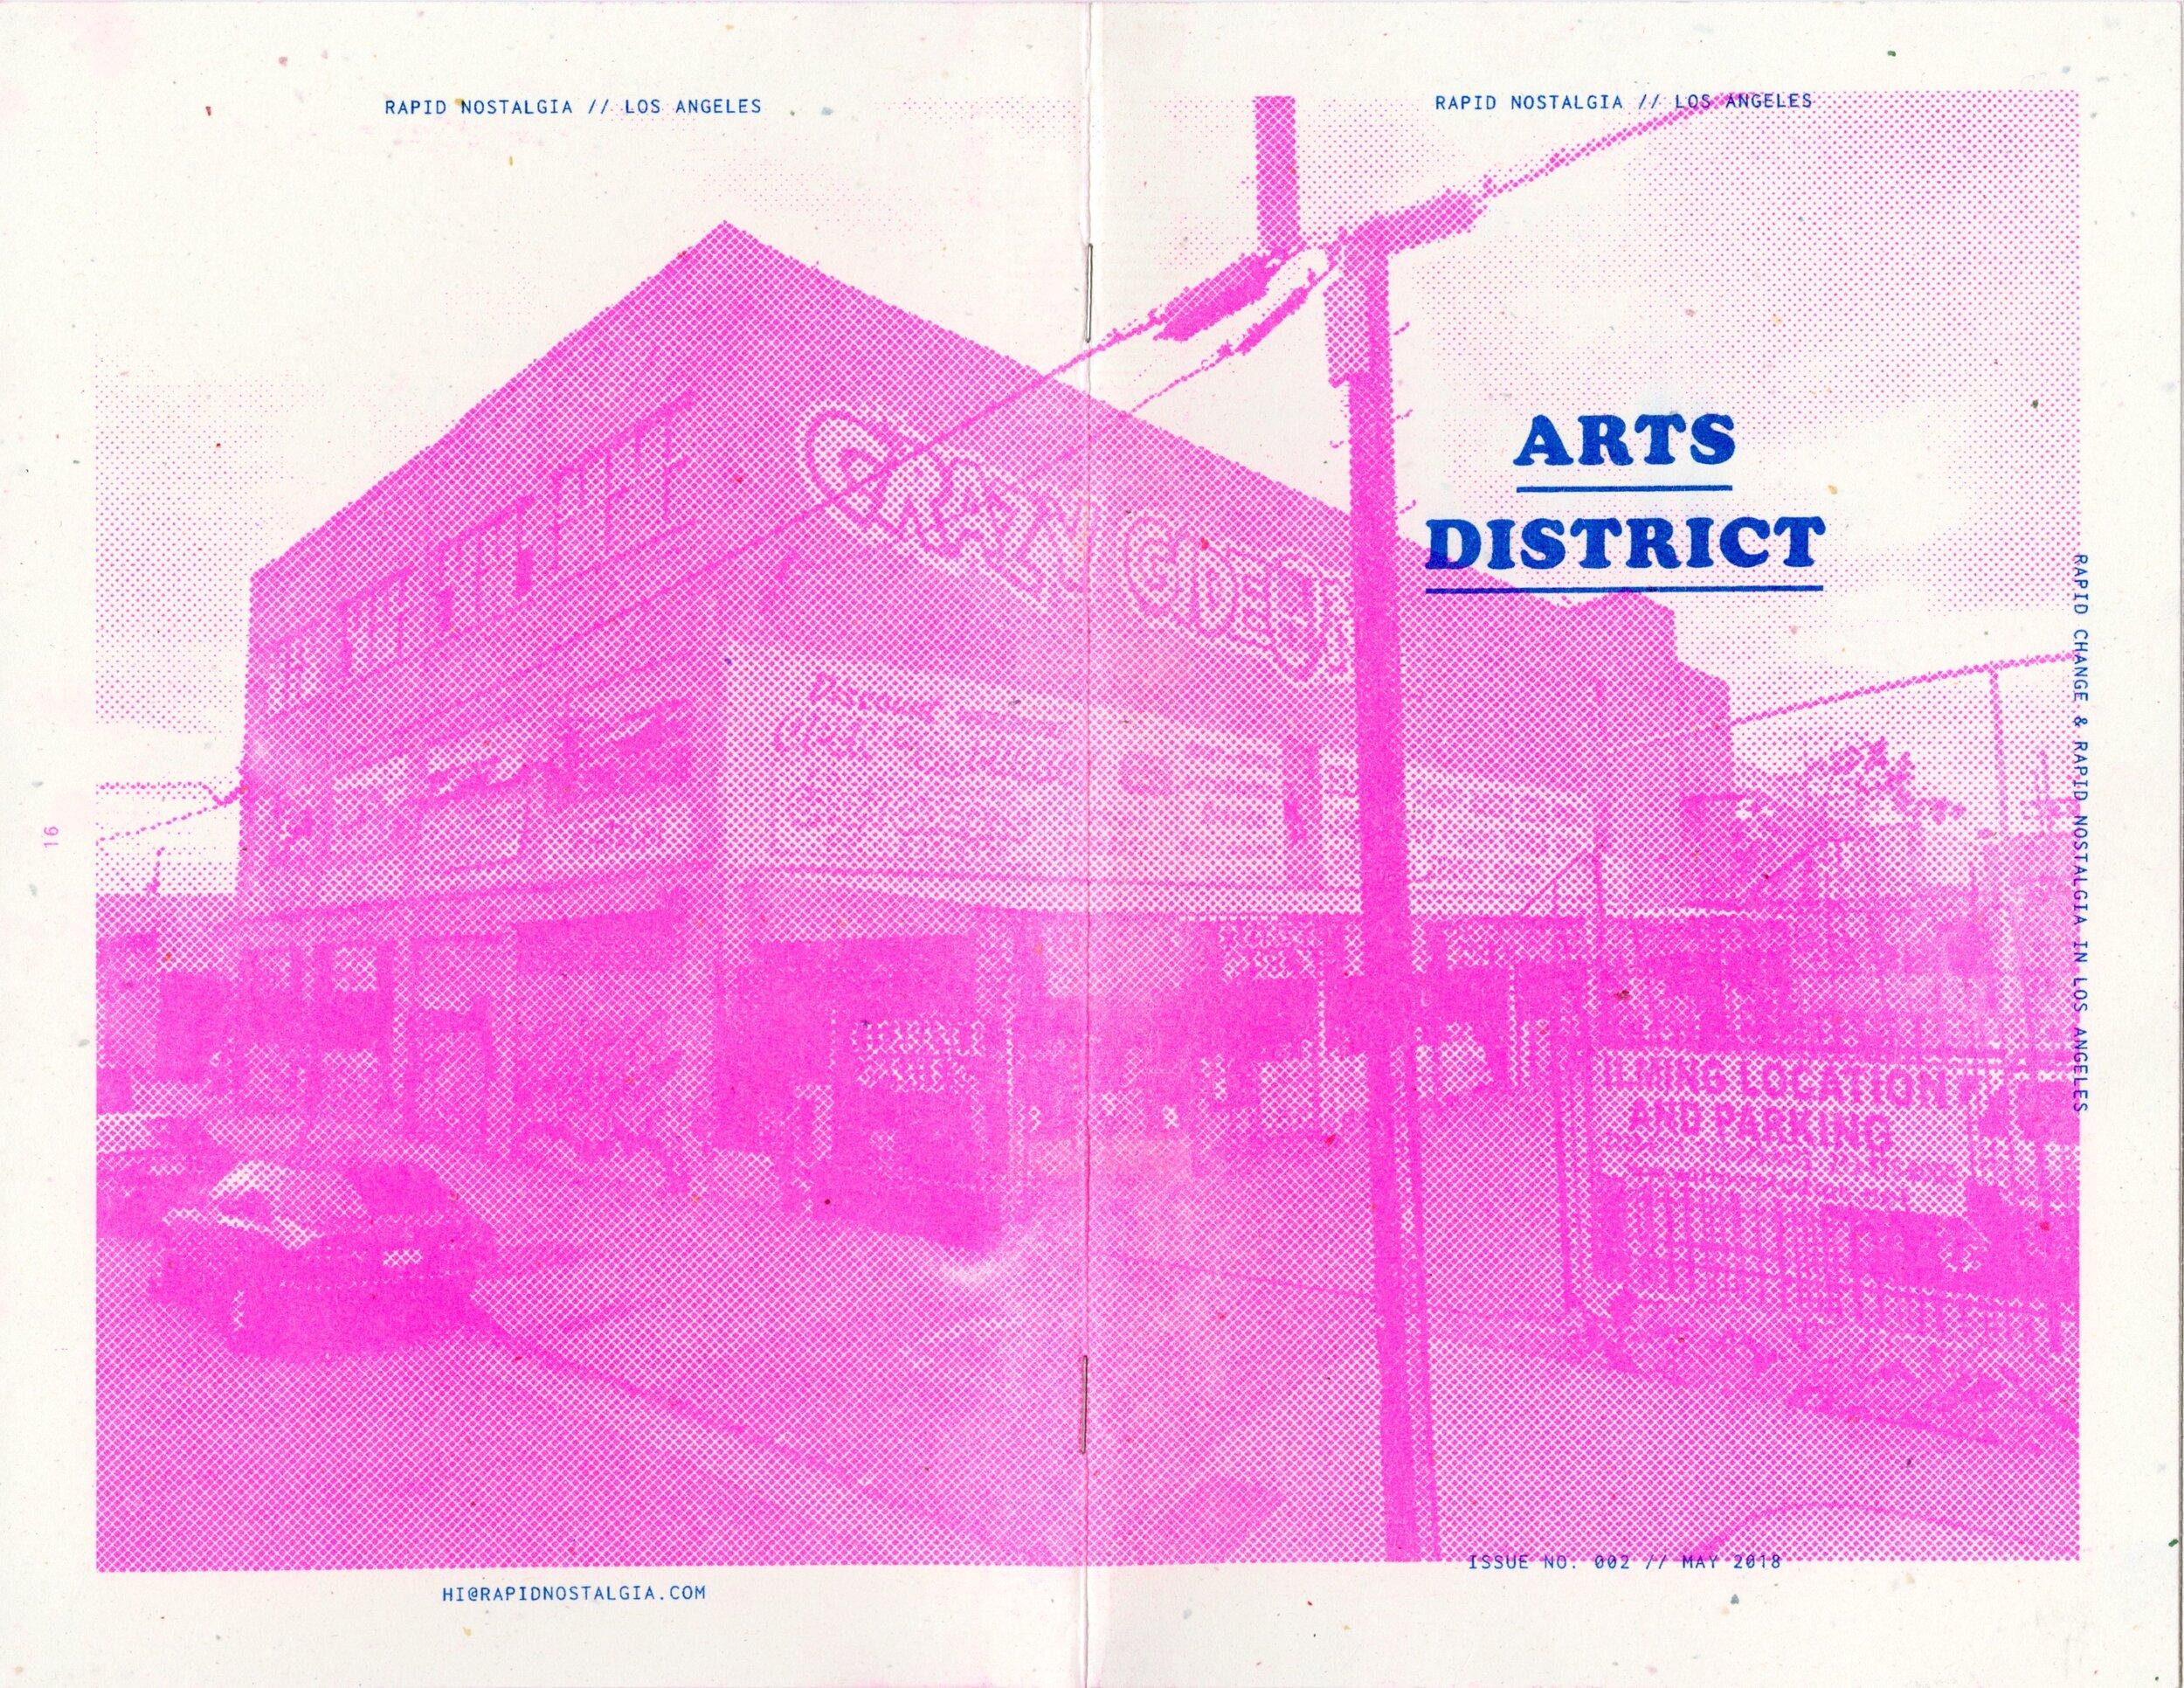 Coming Soon:Arts District - Rapid Nostalgia No. 002